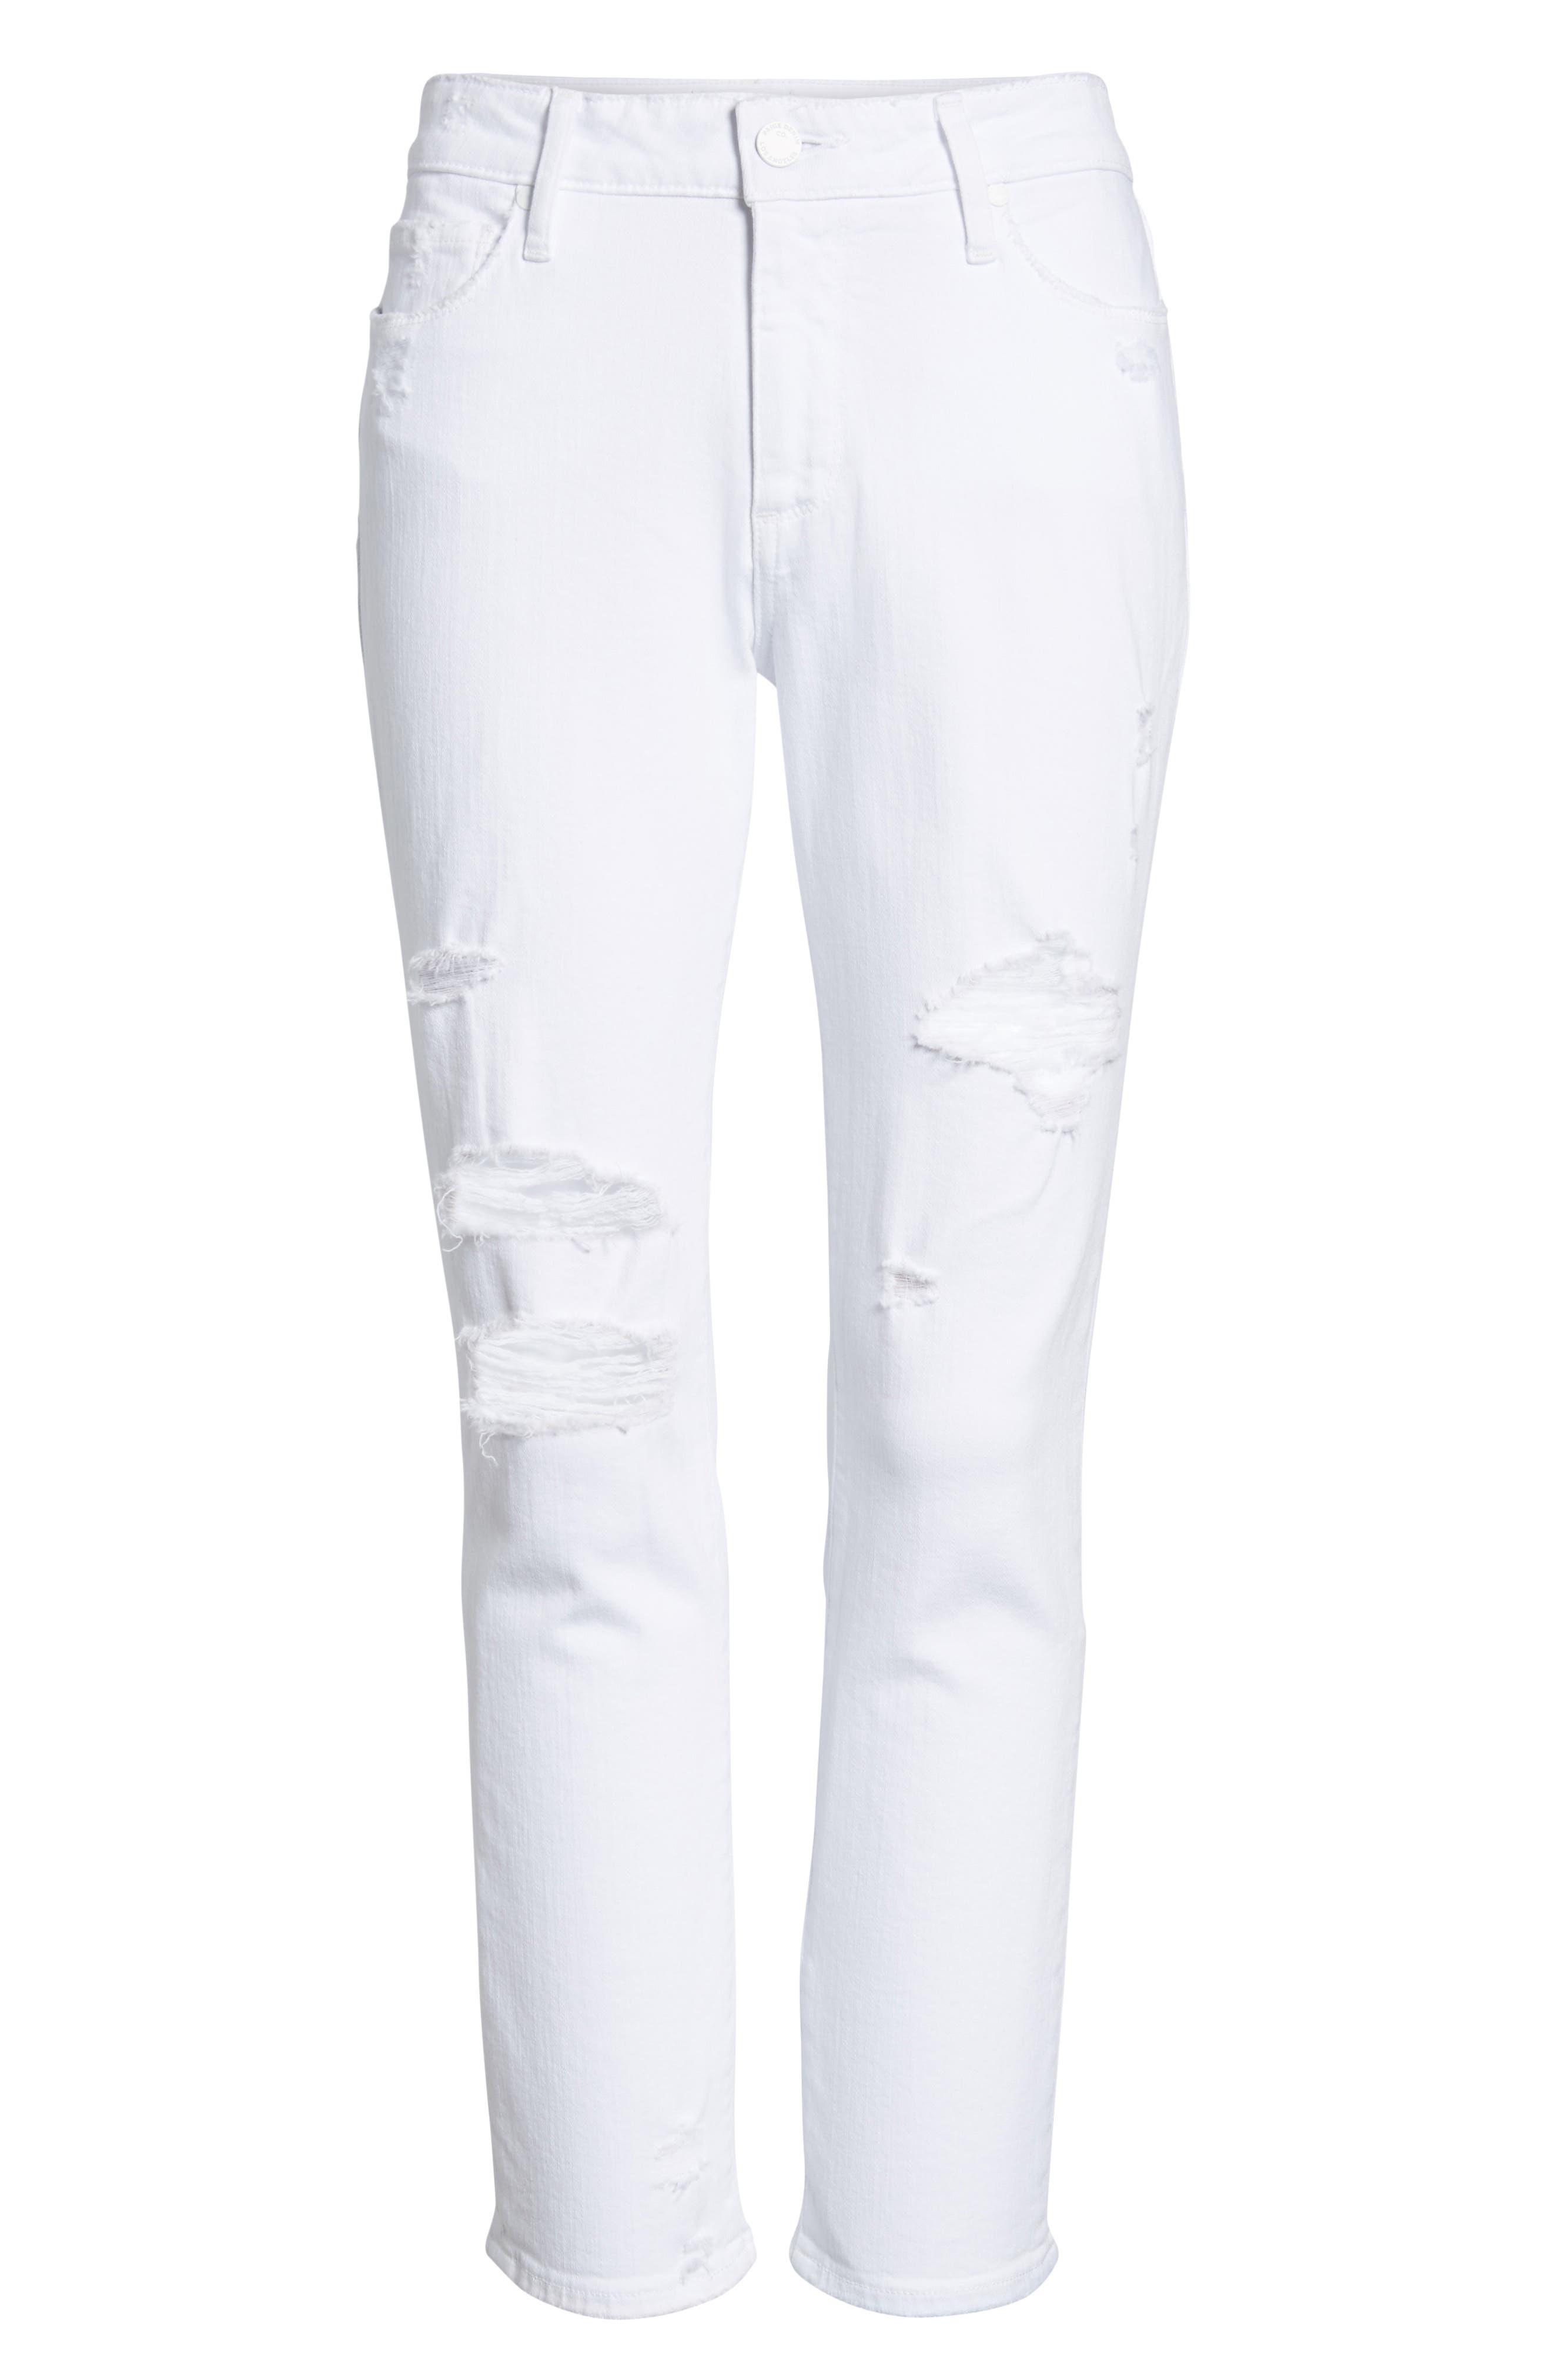 Brigitte Ripped Crop Boyfriend Jeans,                             Alternate thumbnail 7, color,                             100